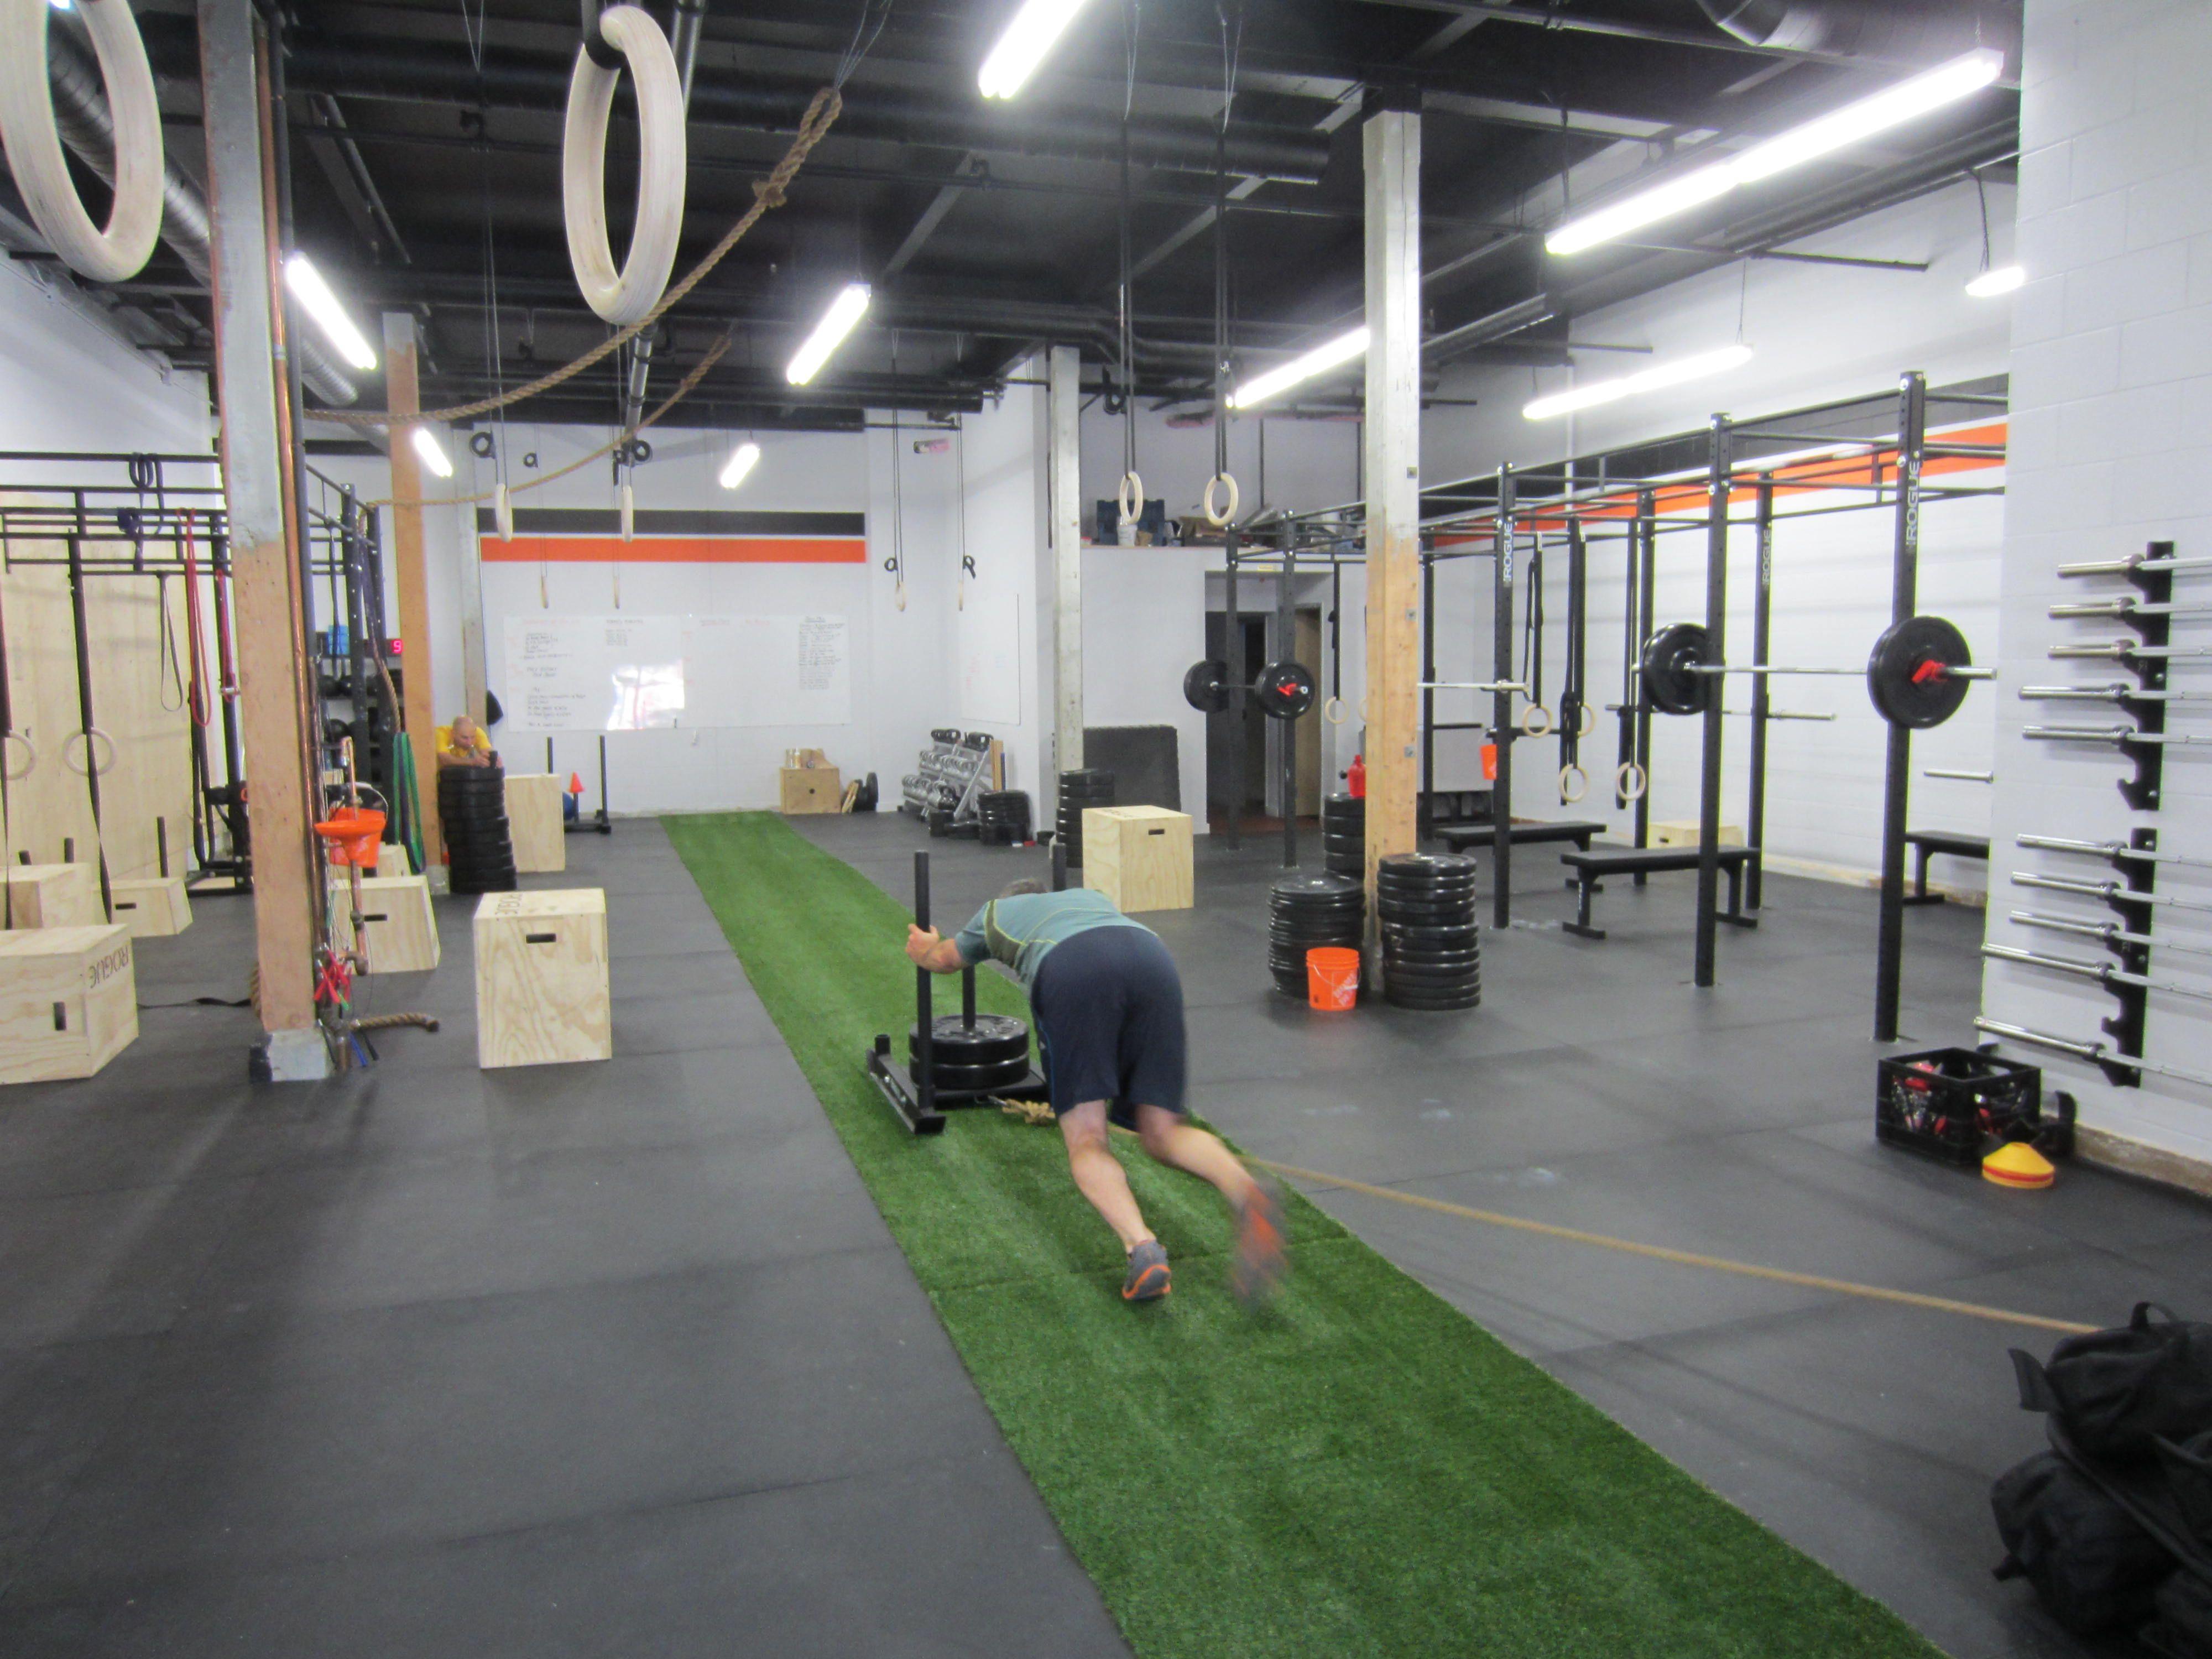 CrossFit Gym Interior